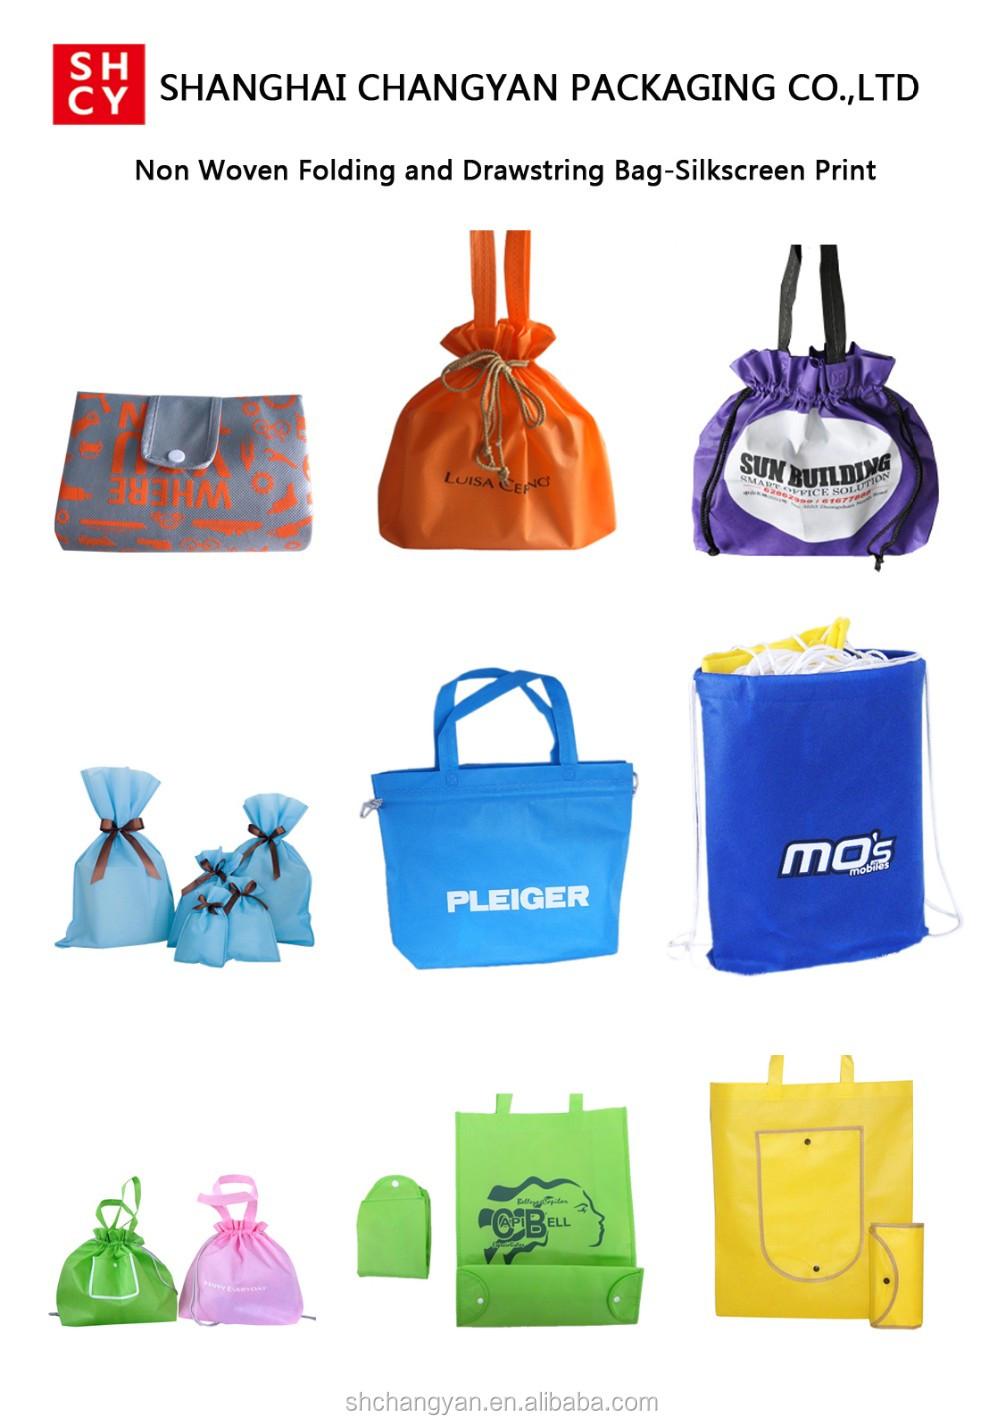 non woven folding and drawstring bag.jpg